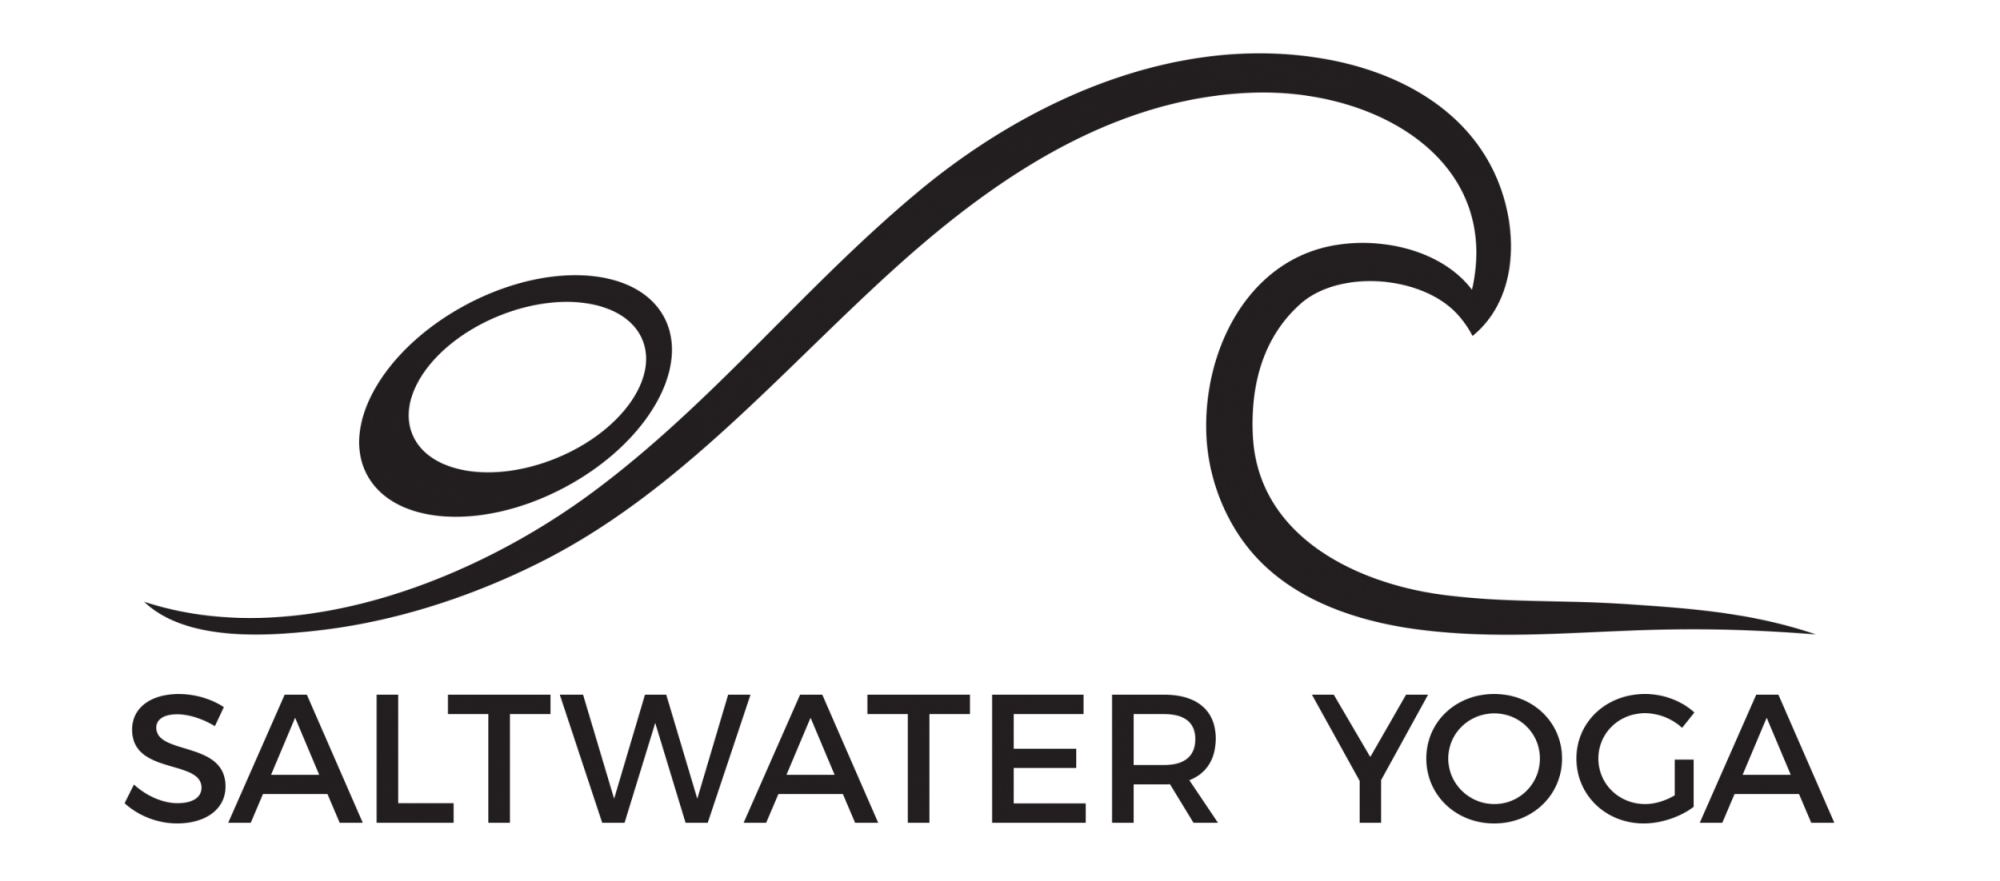 saltwater yoga